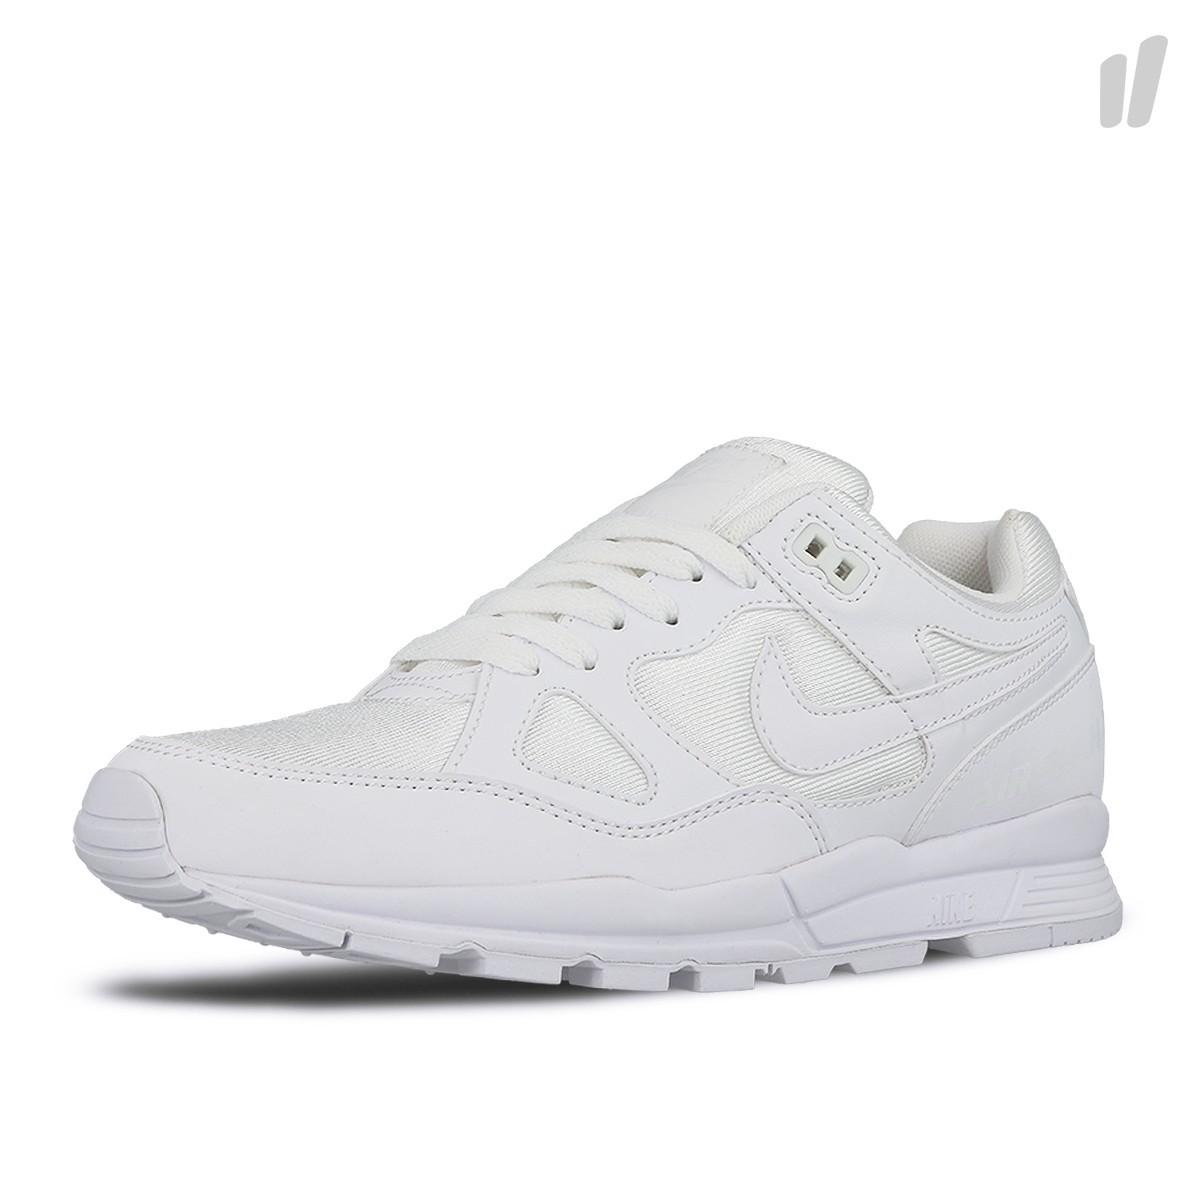 e466c705e24018 Nike Wmns Air Span Ii Sz 10US AH6800-101 and 50 similar items